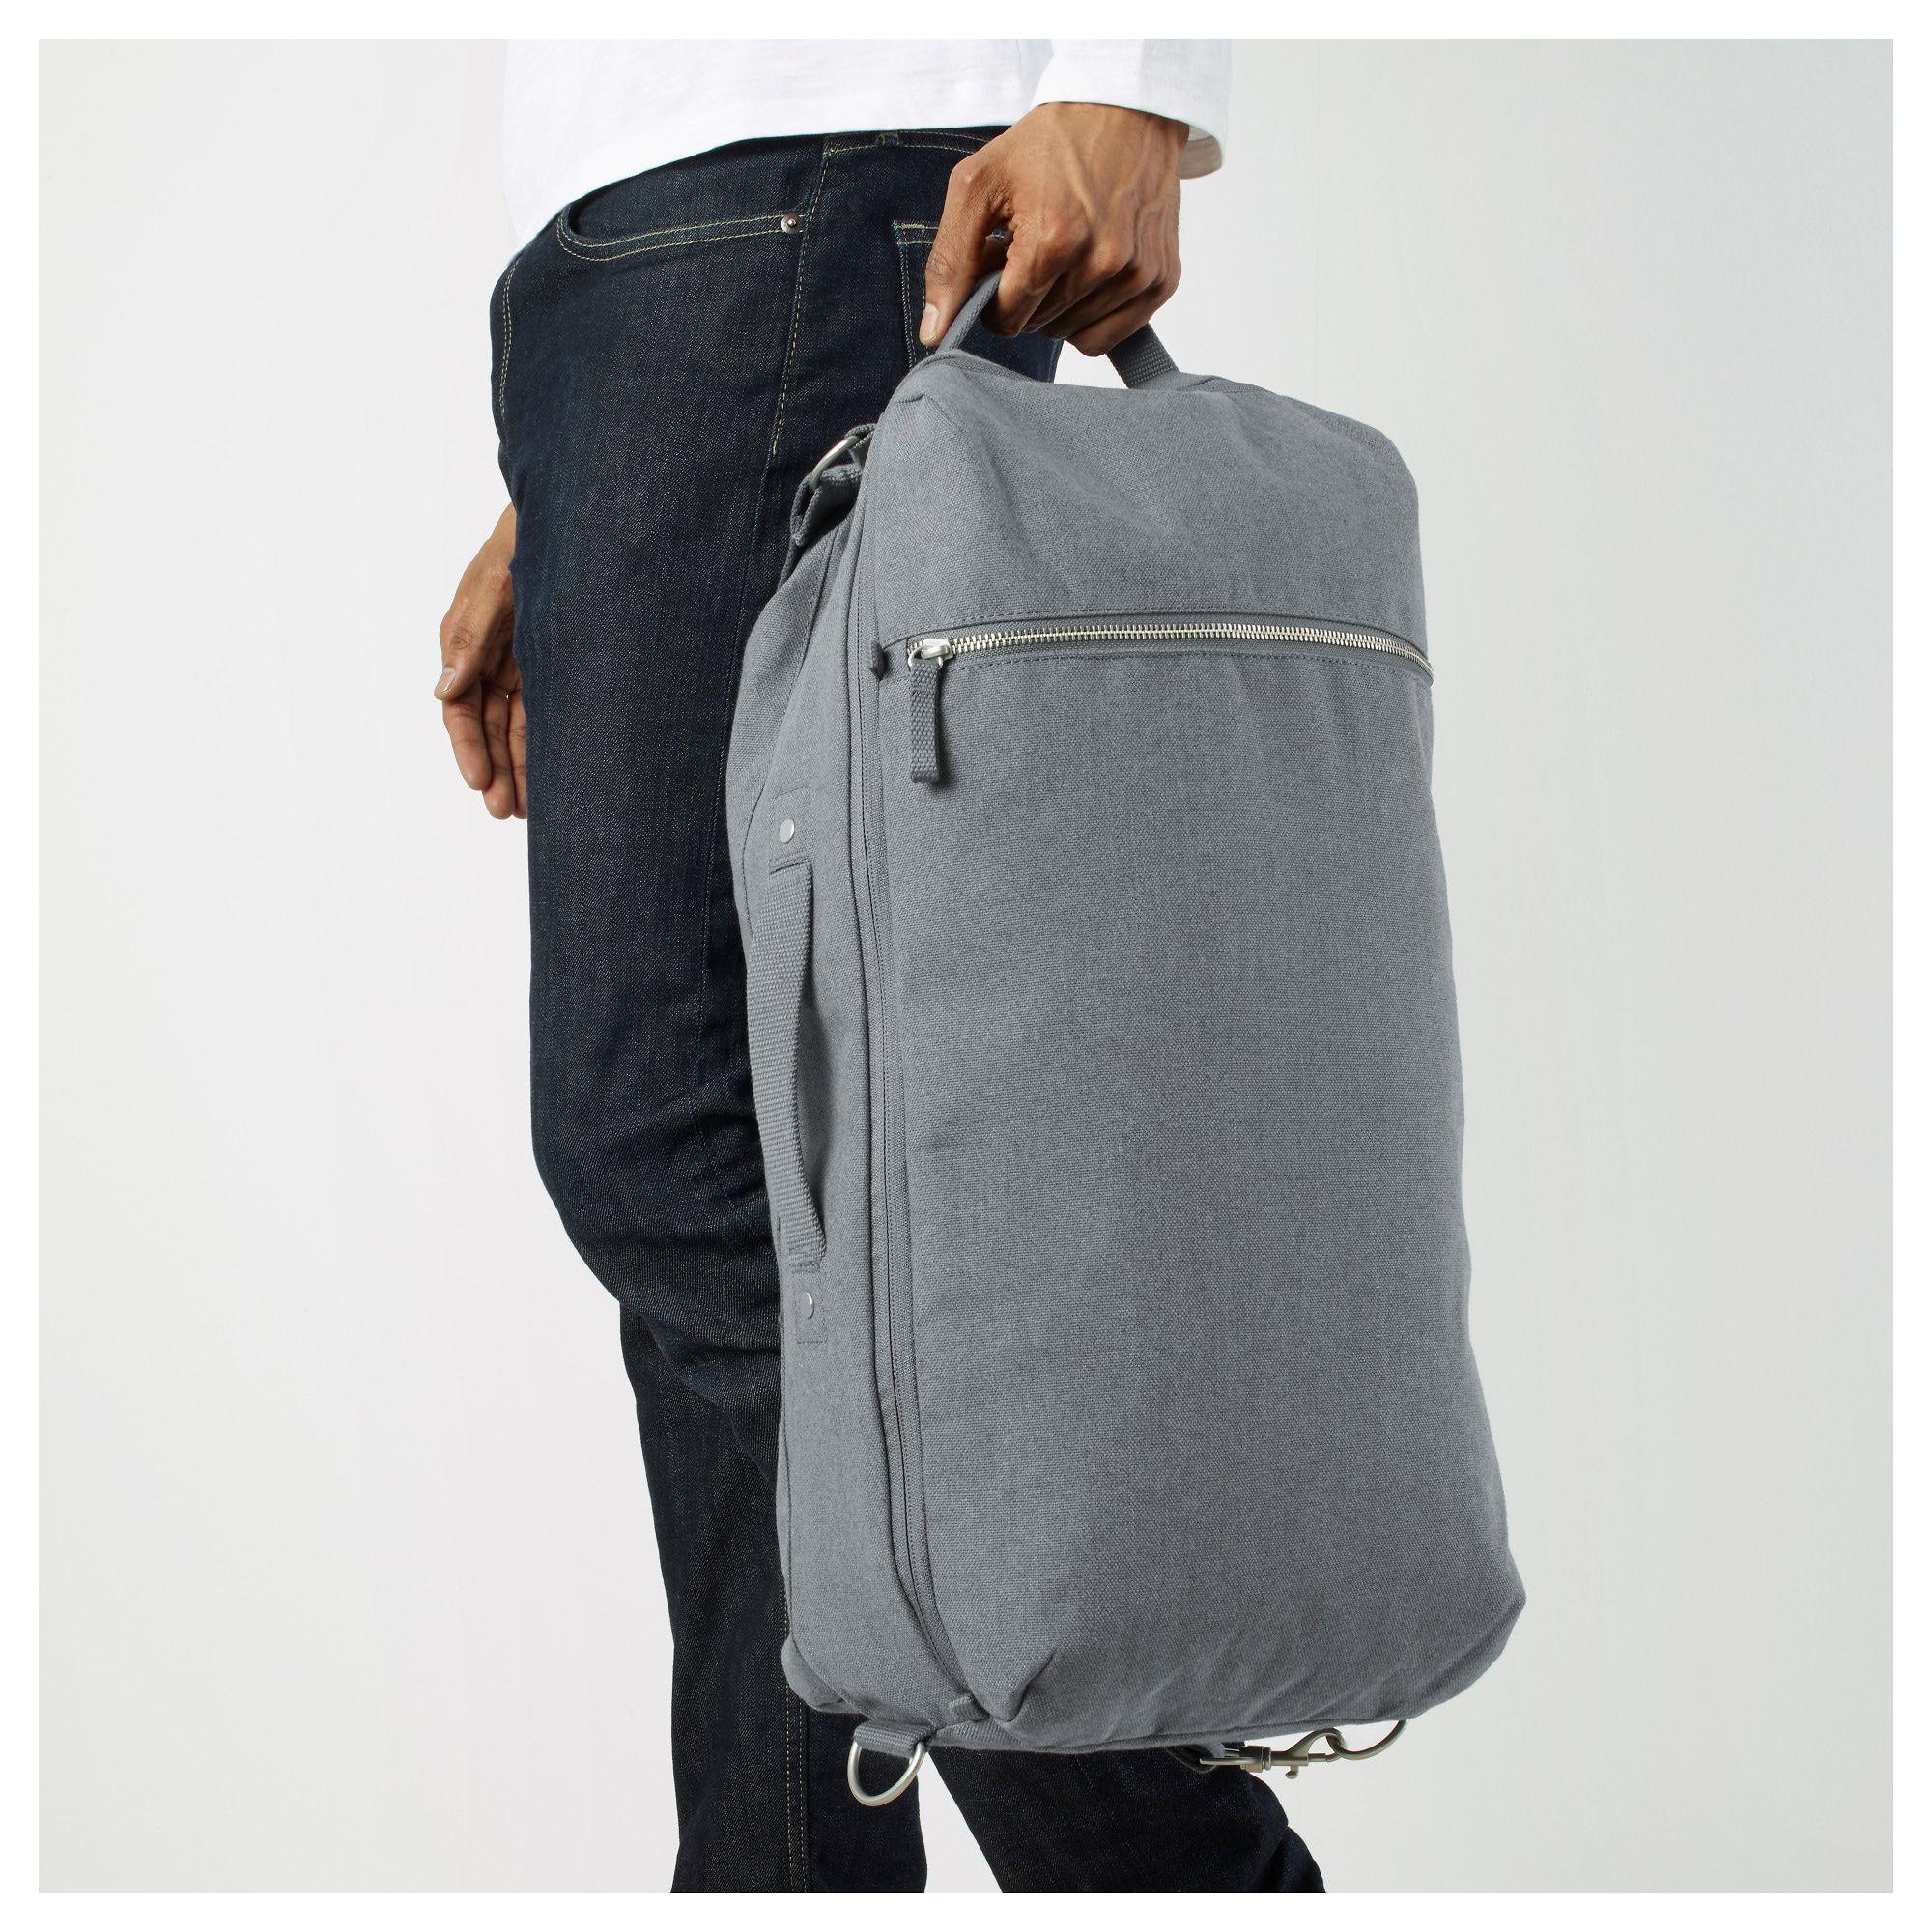 alta sansa pantofi de sport cel mai bun preț IKEA - FÖRENKLA Backpack light gray   Backpacks, Backpack bags ...